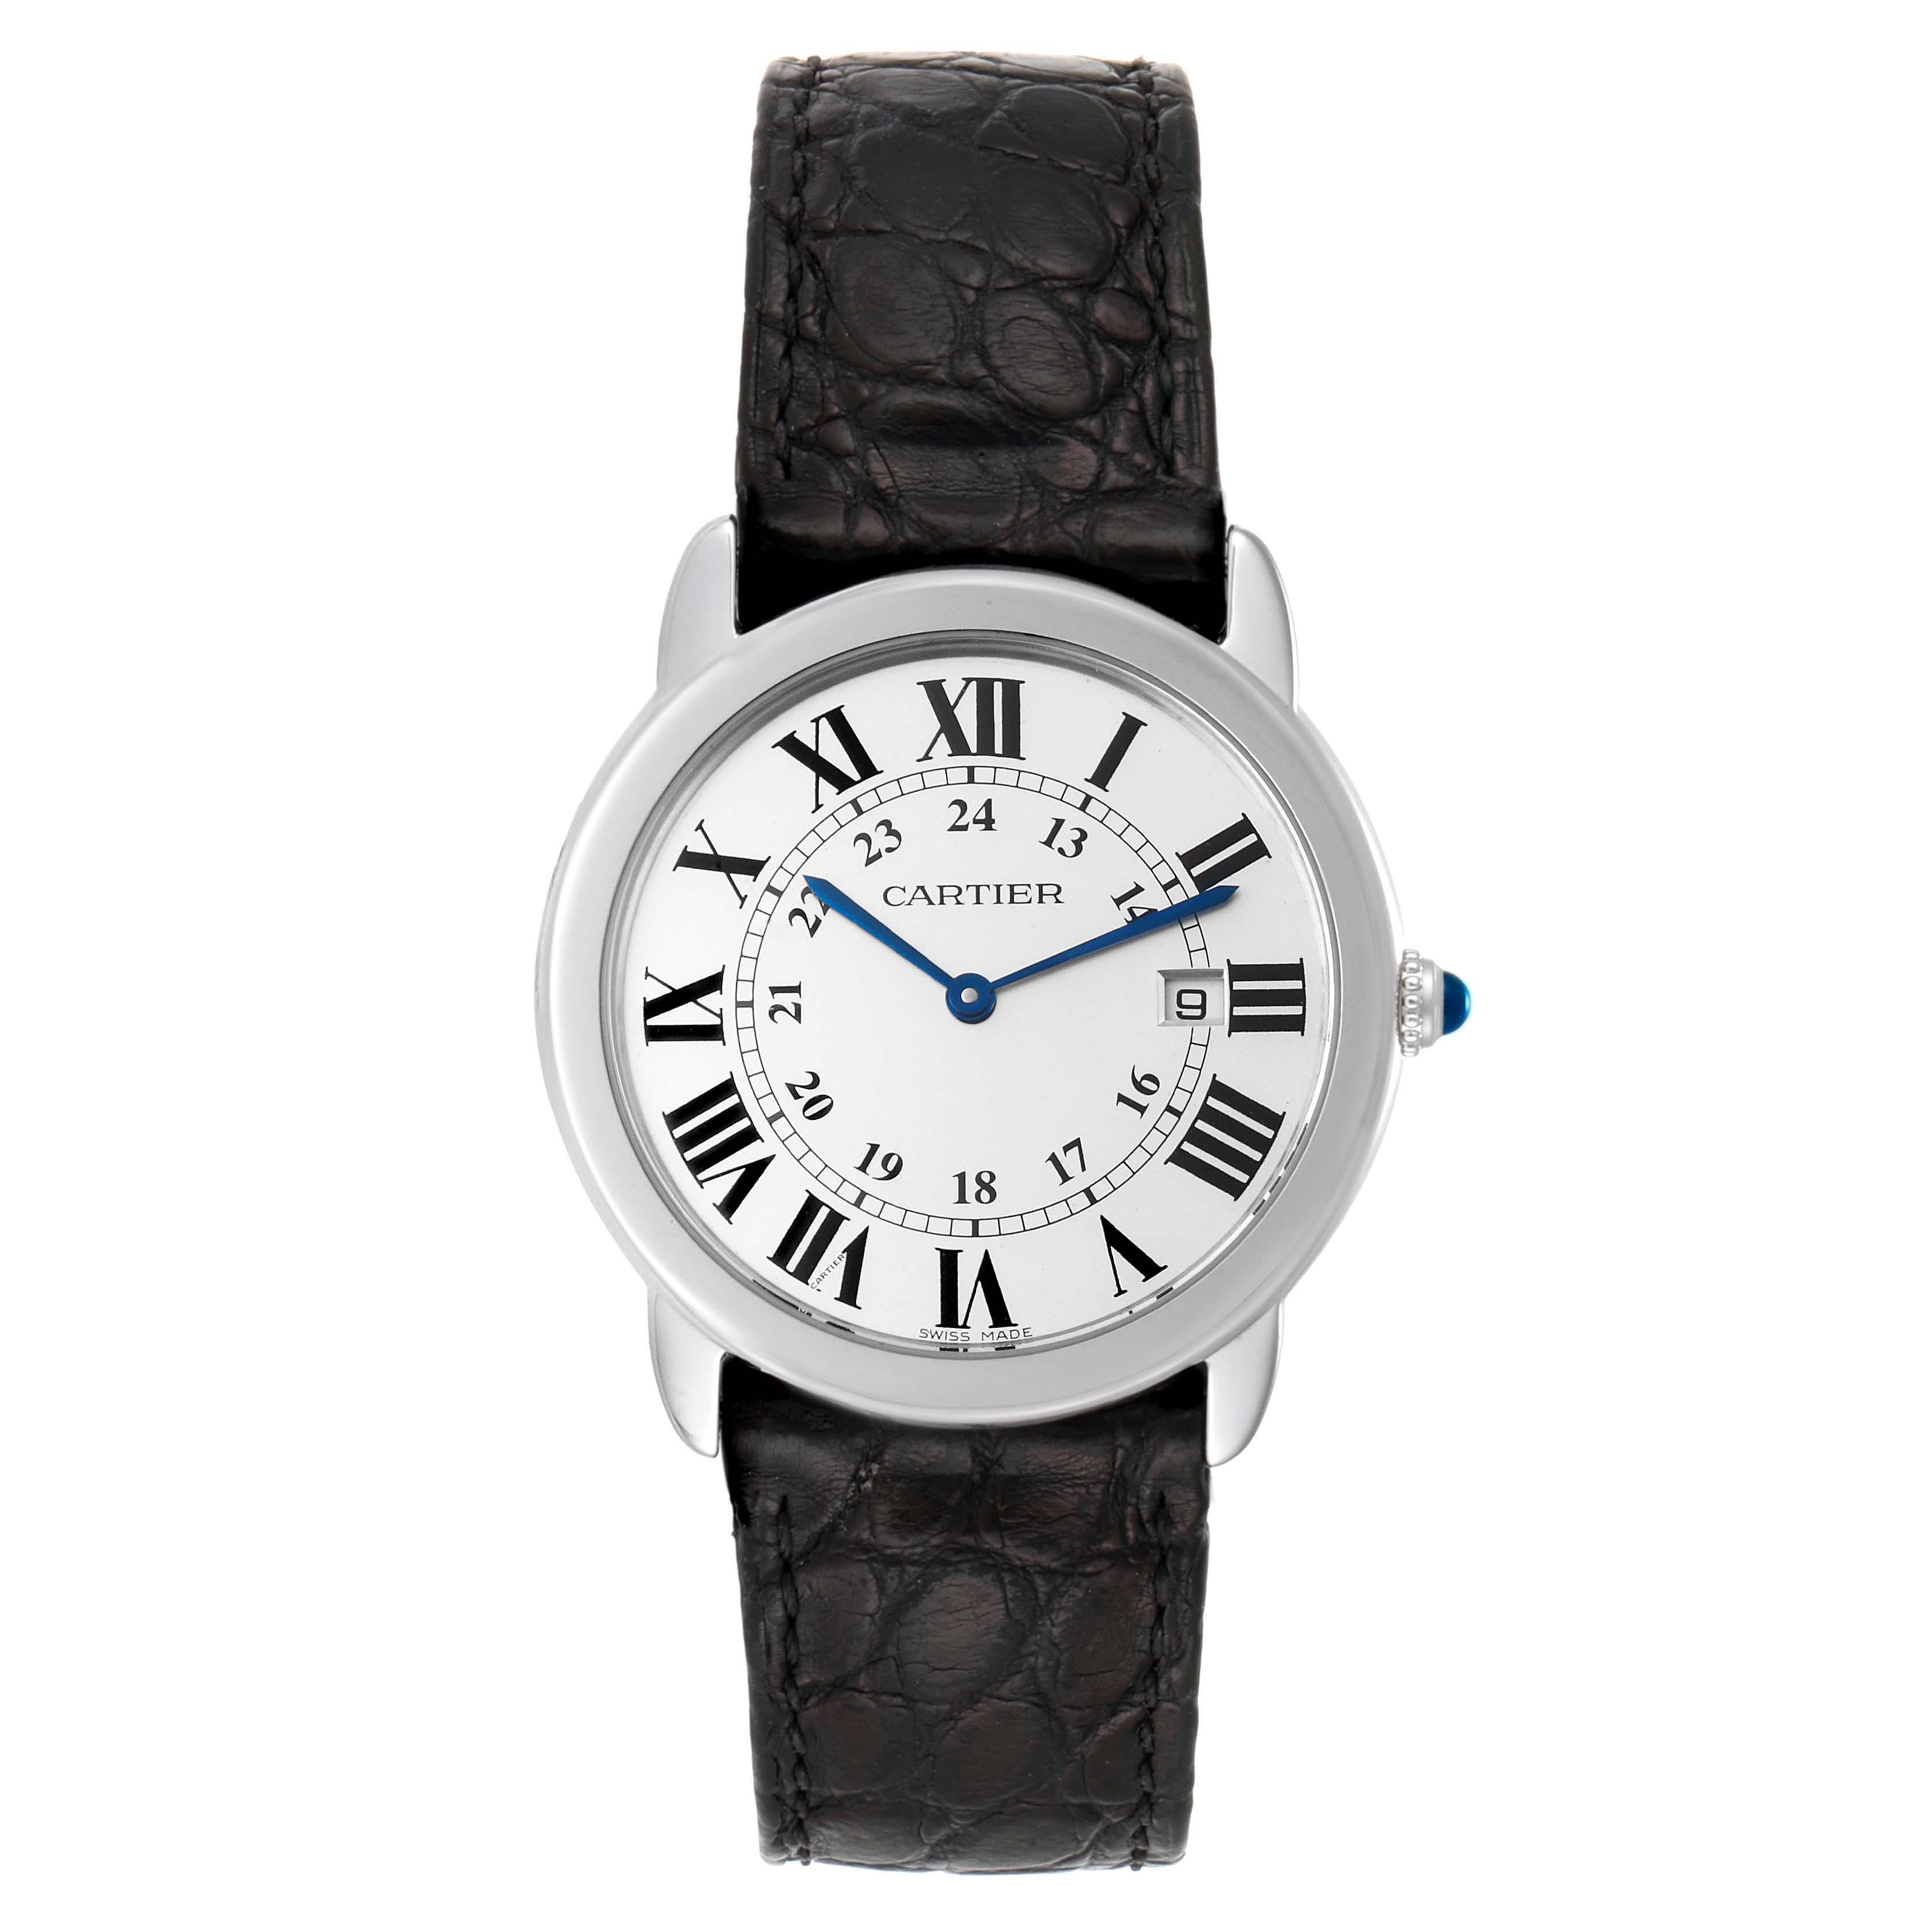 Cartier Ronde Solo Large Steel Unisex Watch W6700255 Box SwissWatchExpo